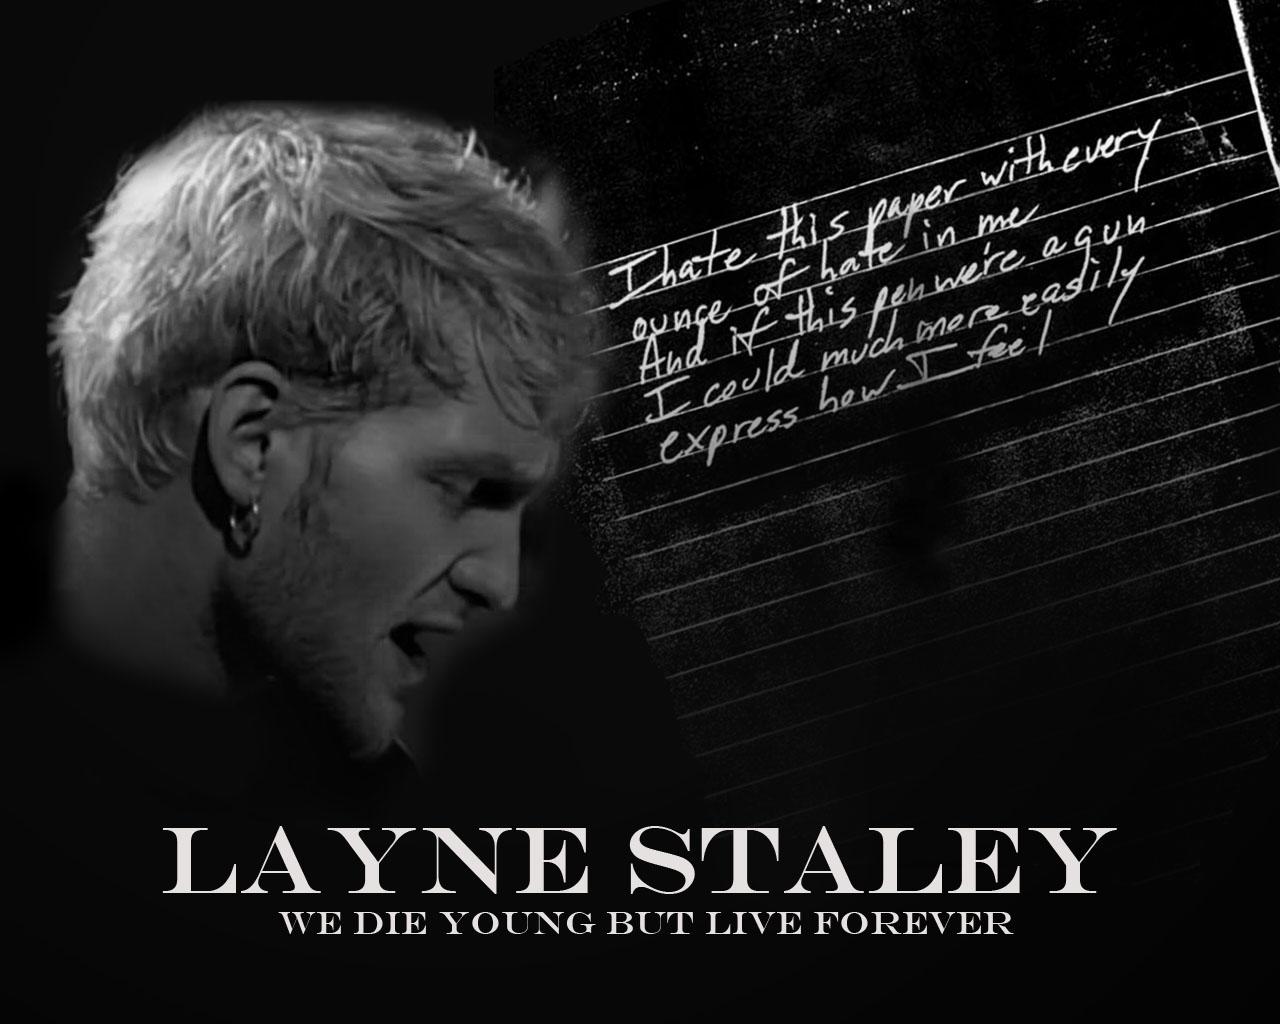 layne staley desktop